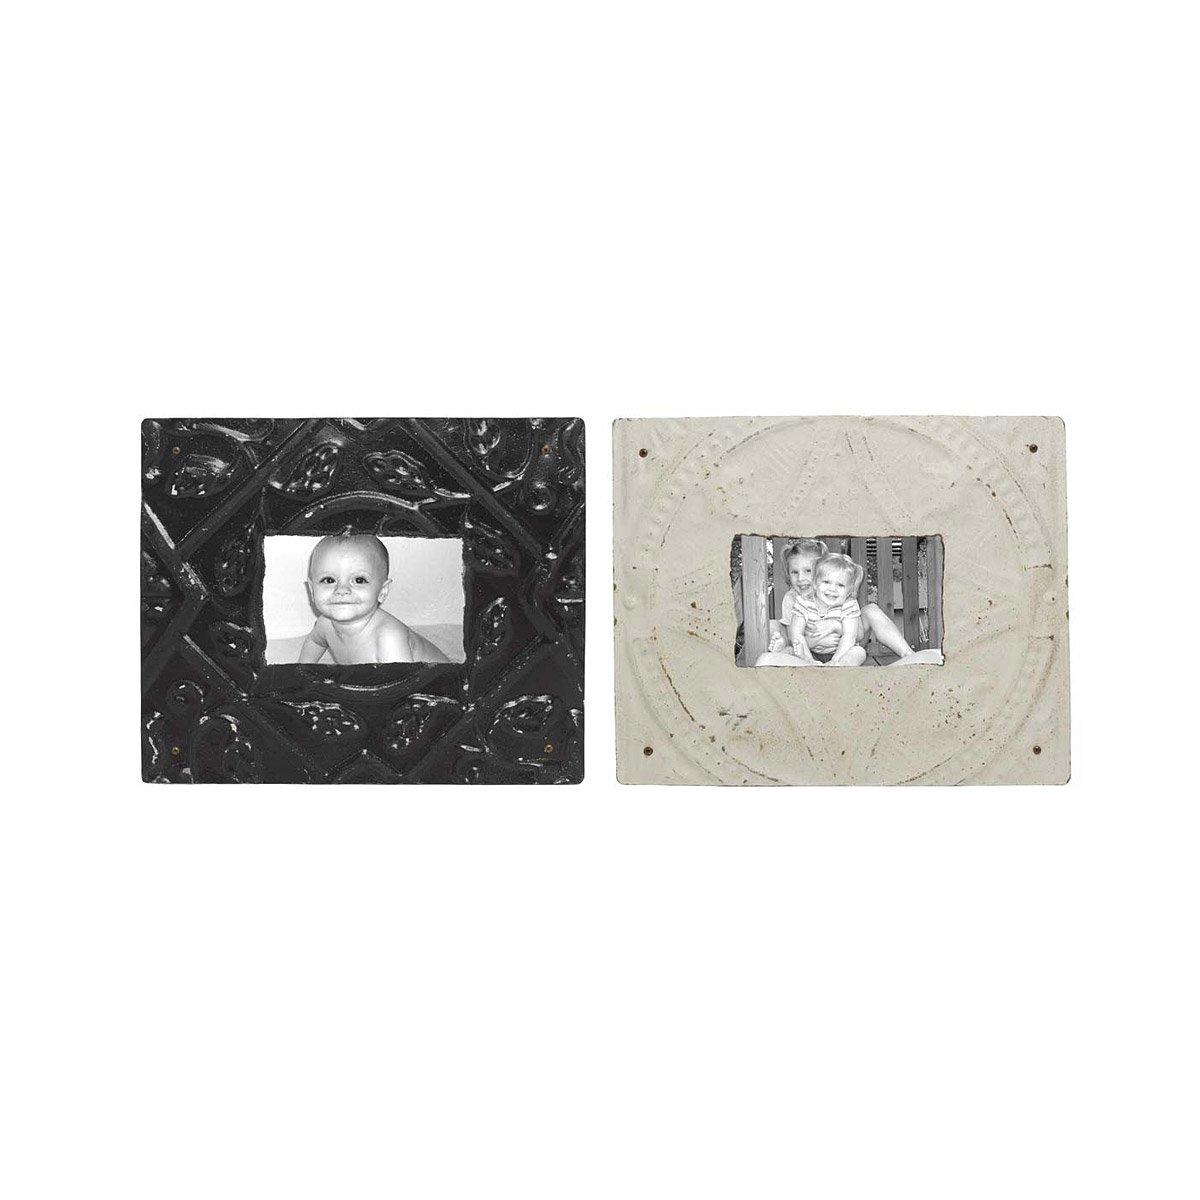 Small Reclaimed Tin Frames | Rustic, Handmade, Nostalgic Recycled ...